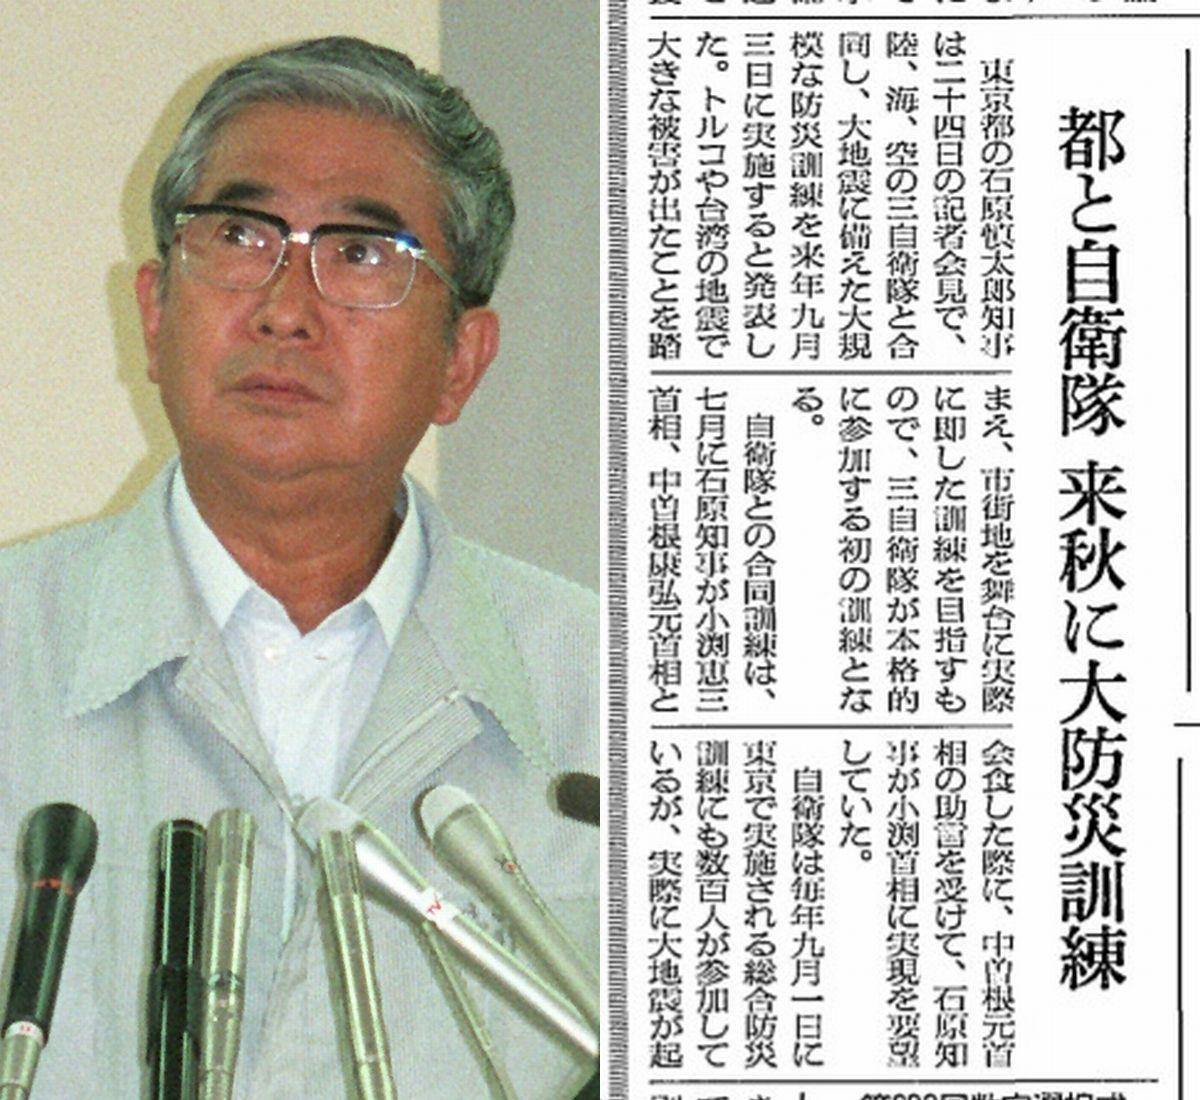 写真・図版 : (右)1999年9月25日付の朝日新聞朝刊の記事。(左)同年に記者会見する石原慎太郎・東京都知事=朝日新聞社